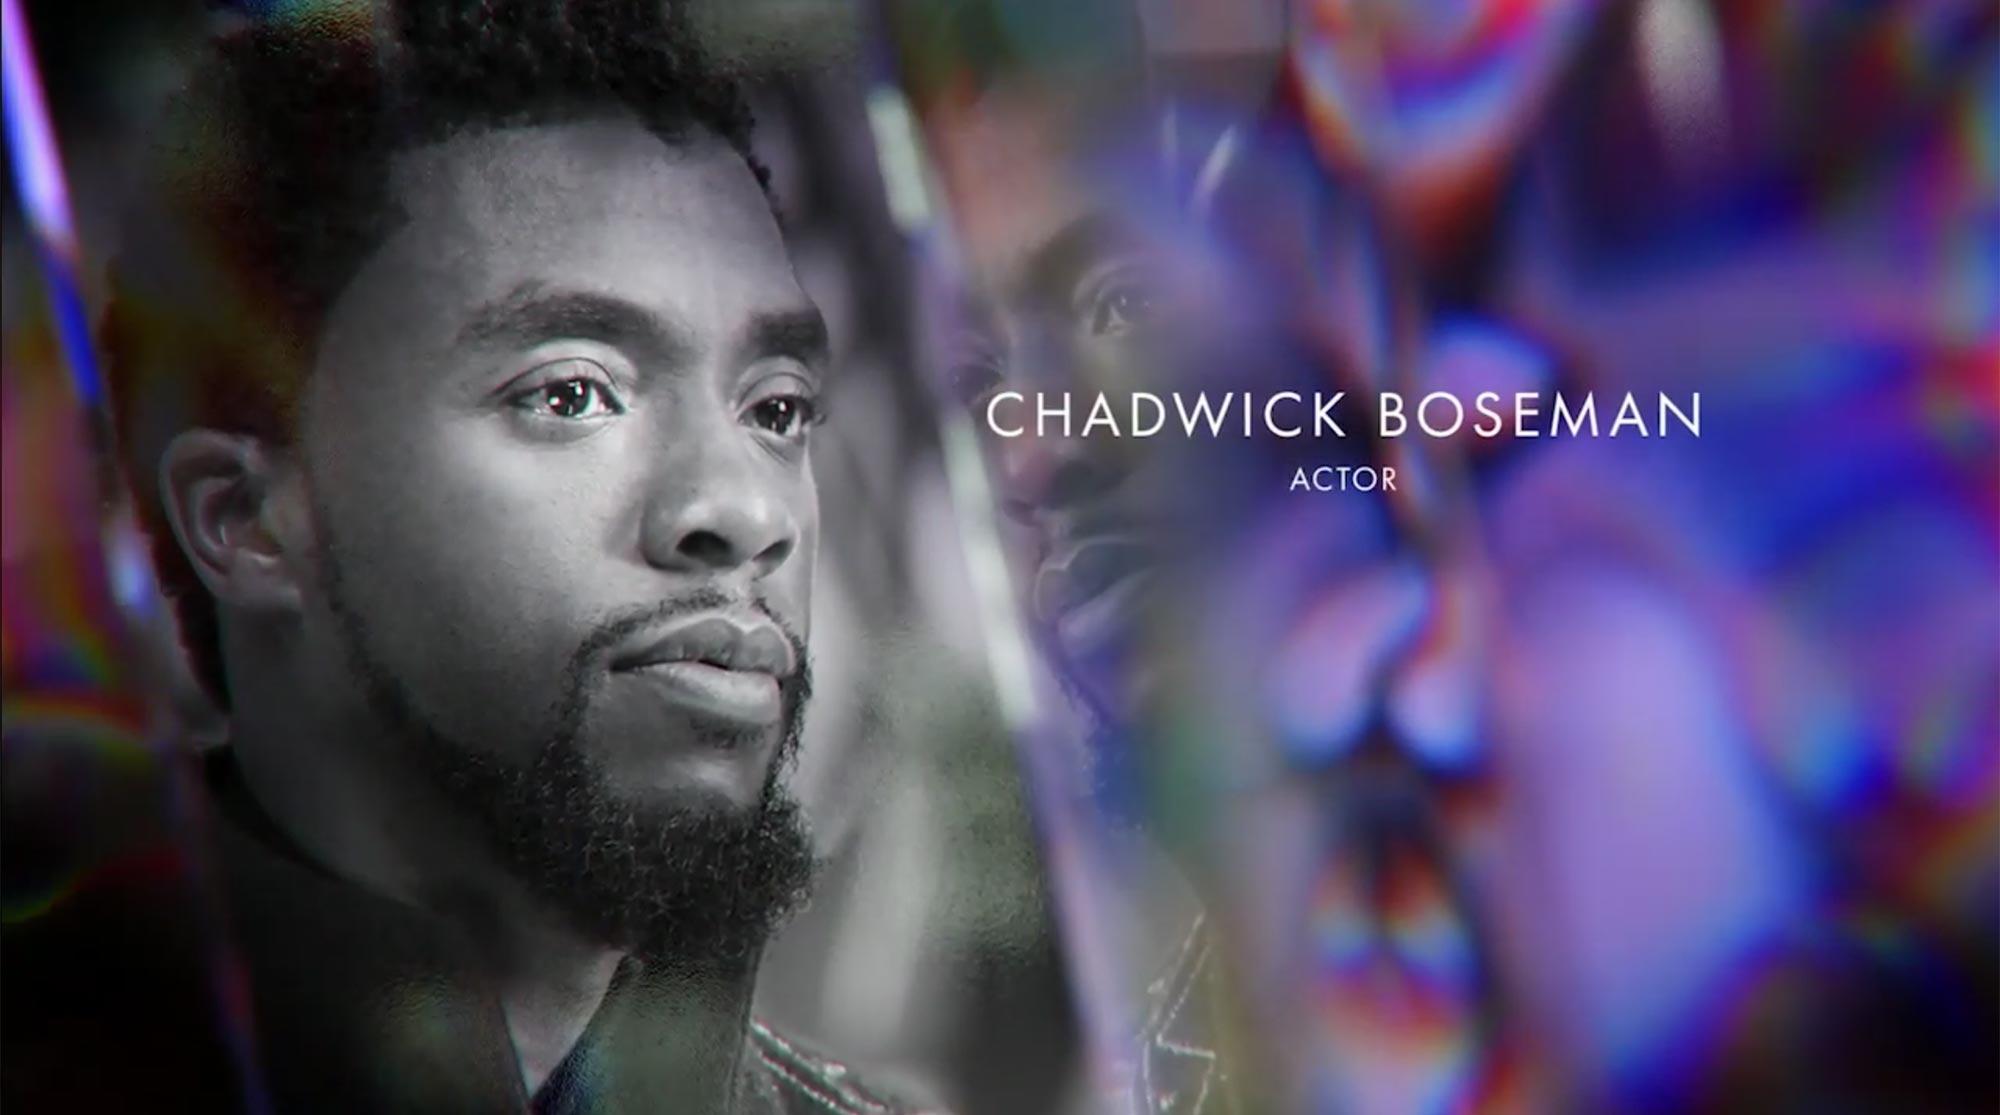 Chadwick Boseman in Oscars In Memoriam